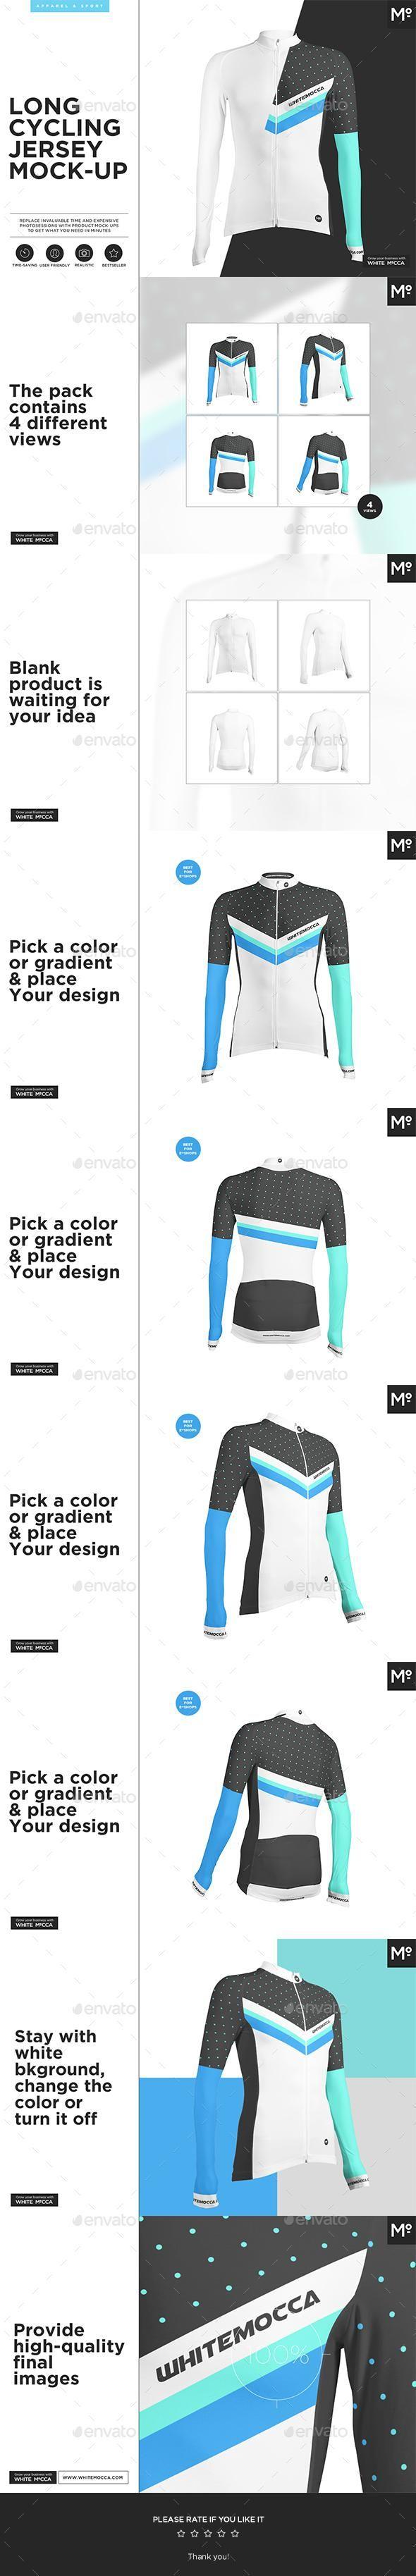 Download Long Cycling Jersey Mock Up For 15 Envato Market Mockup Psd Template Apparelmockup Apparel Fashion Fashiondesig Clothing Mockup Cycling Jersey Mockup